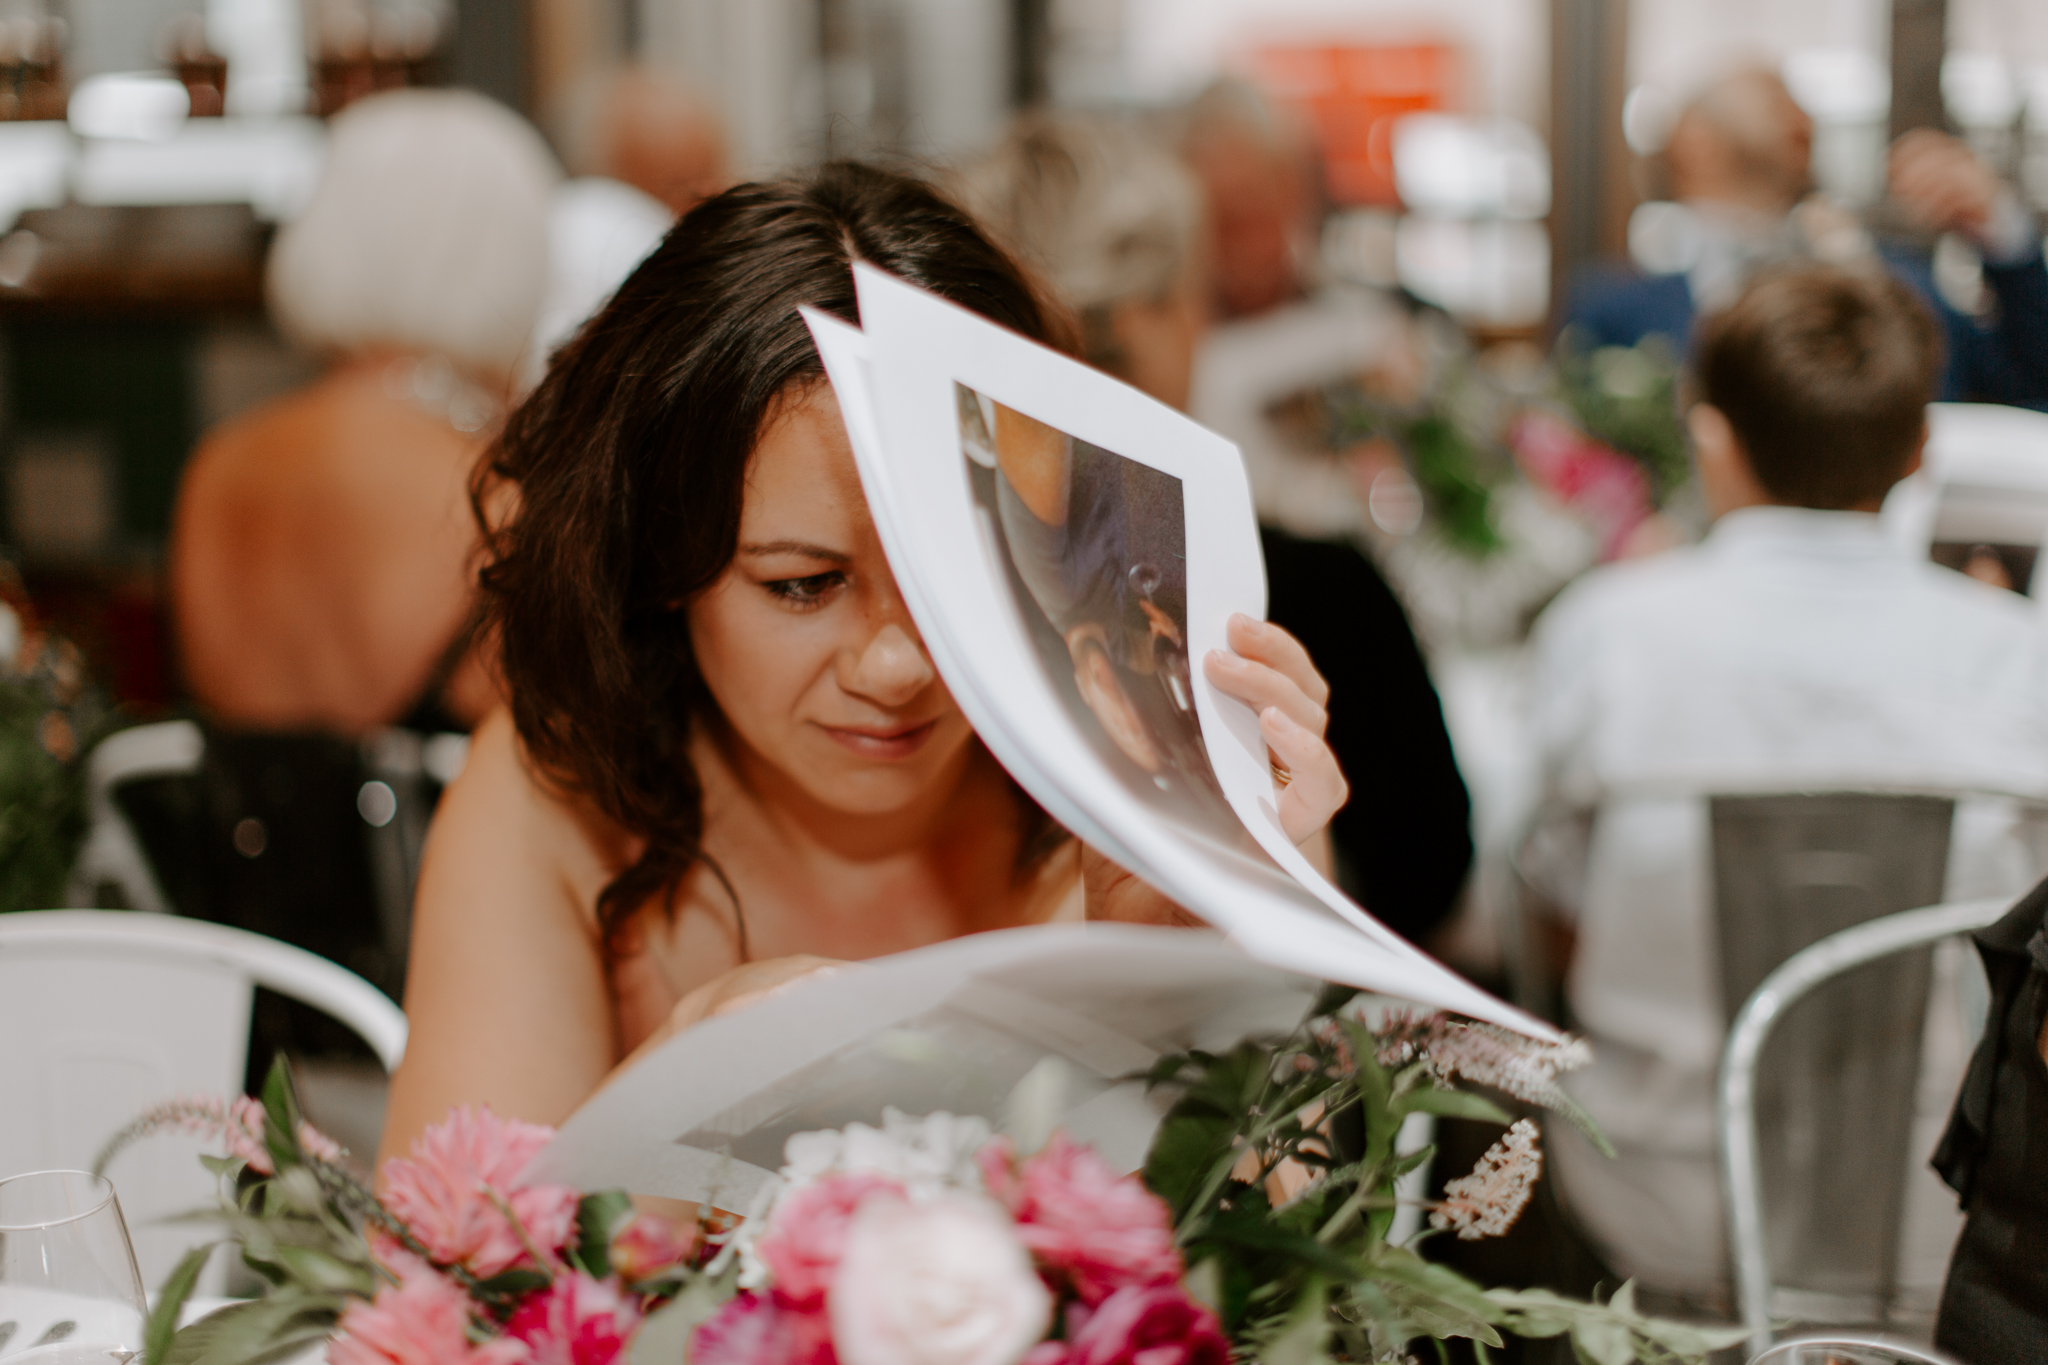 Trunk-restaurant-wedding-EmotionsandMath-072.jpg